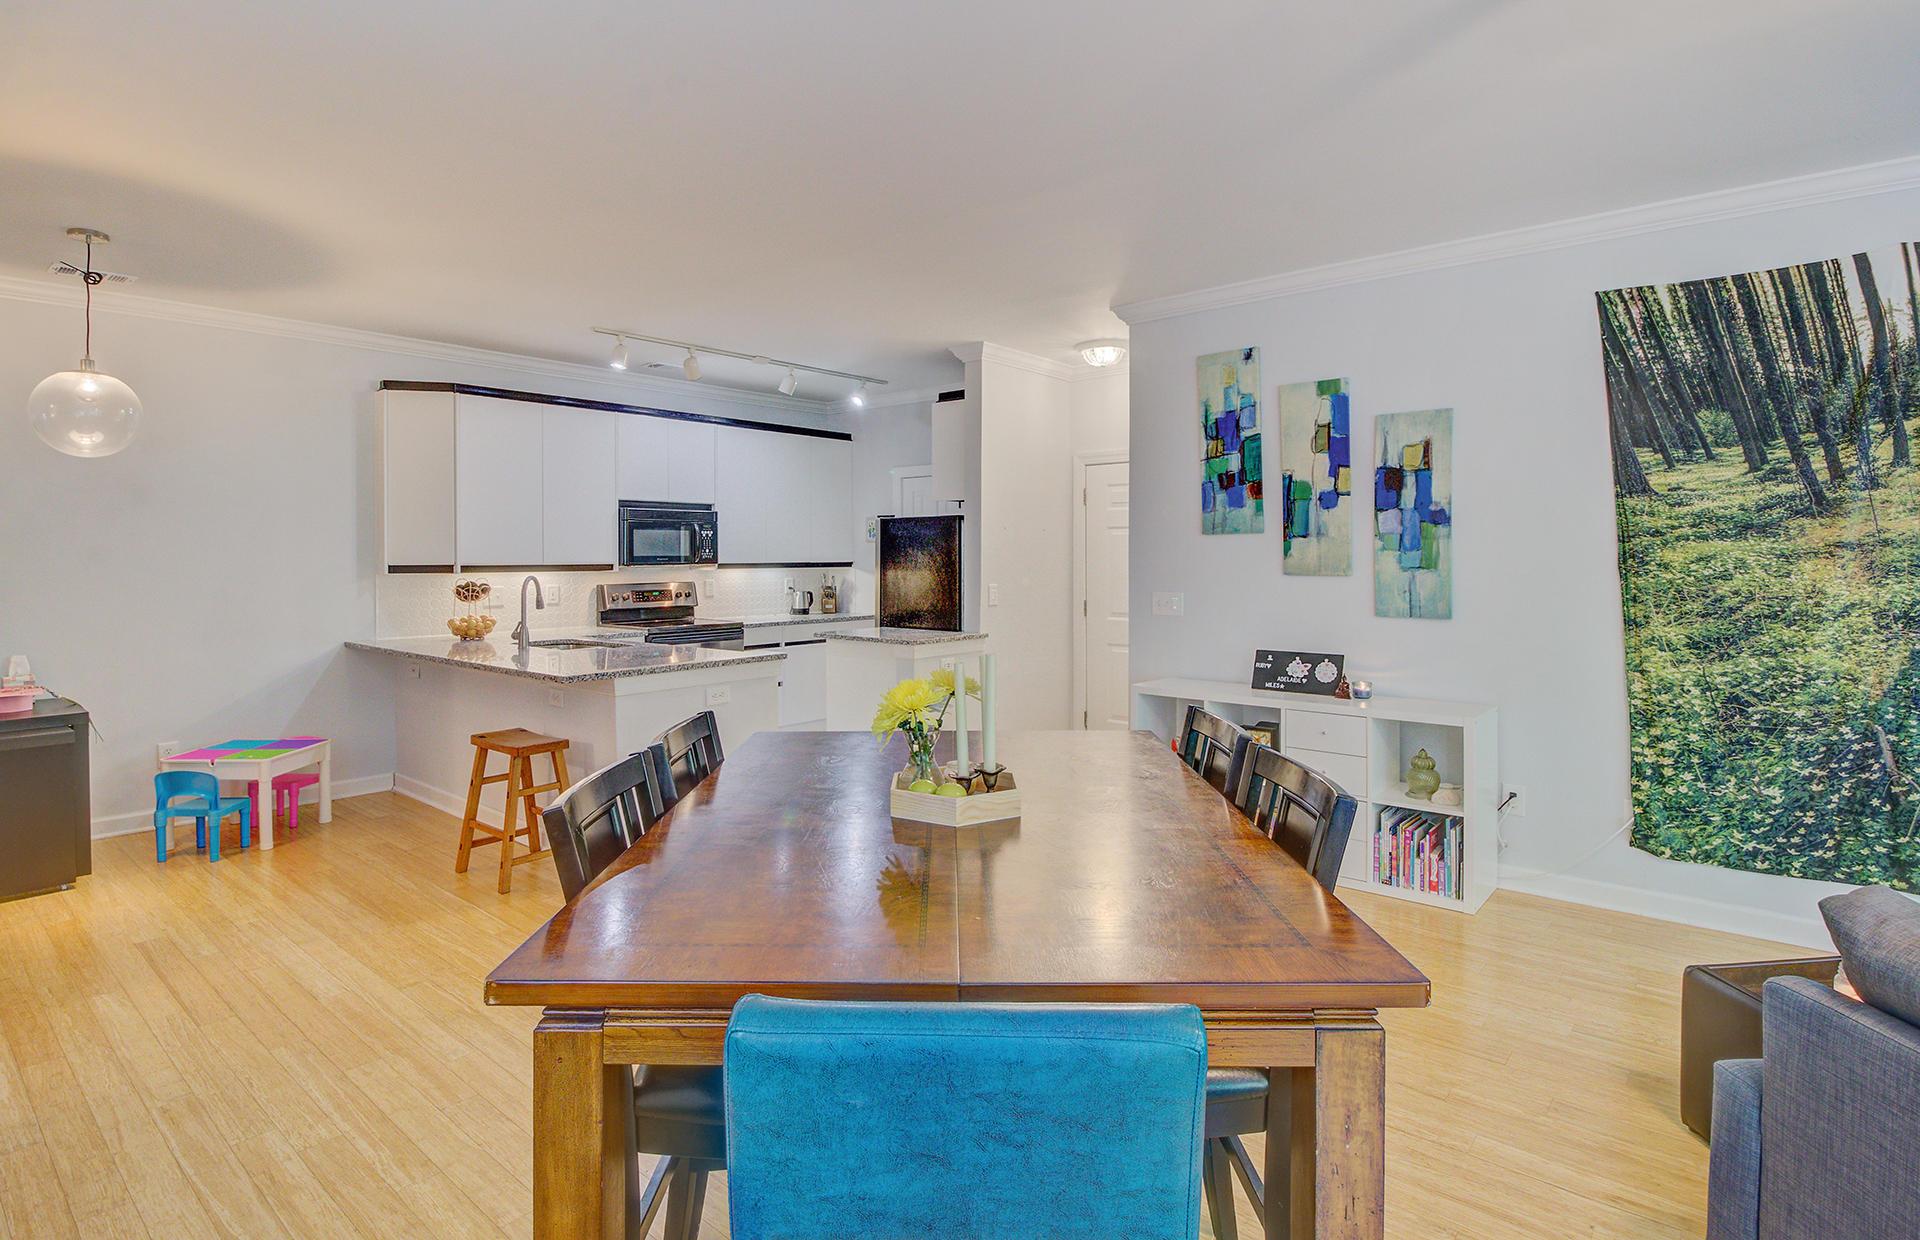 Dunes West Homes For Sale - 1566 Oxborough, Mount Pleasant, SC - 2